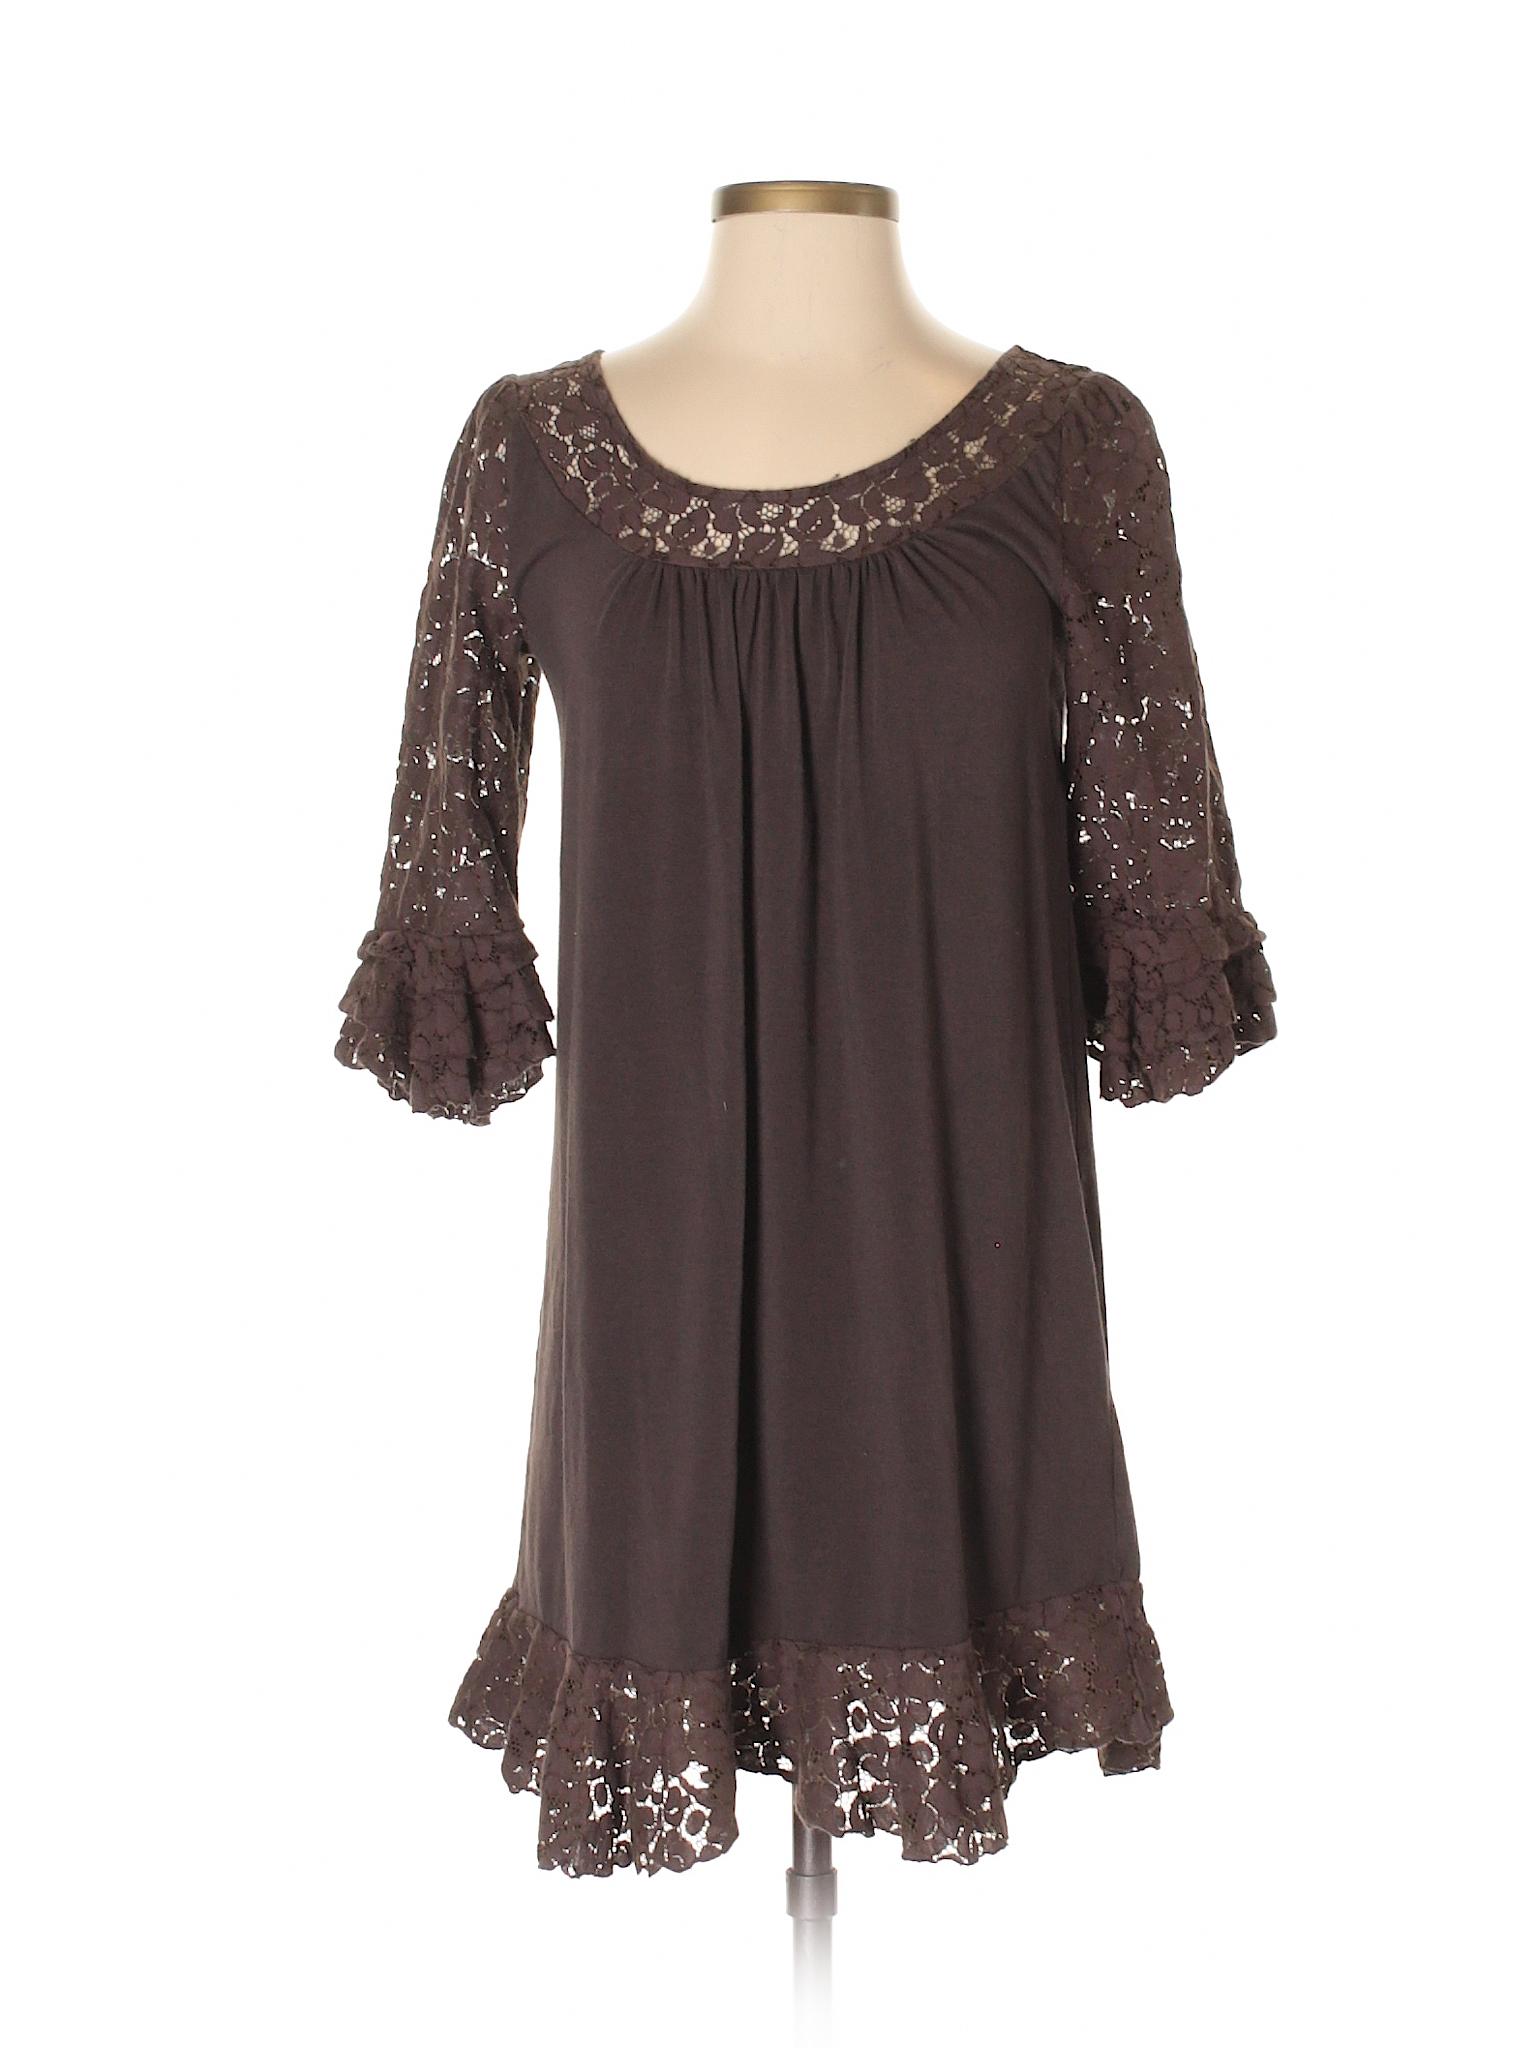 Dress International Selling Moda Selling Casual Dress Moda International Casual Selling Moda nvZTwn8